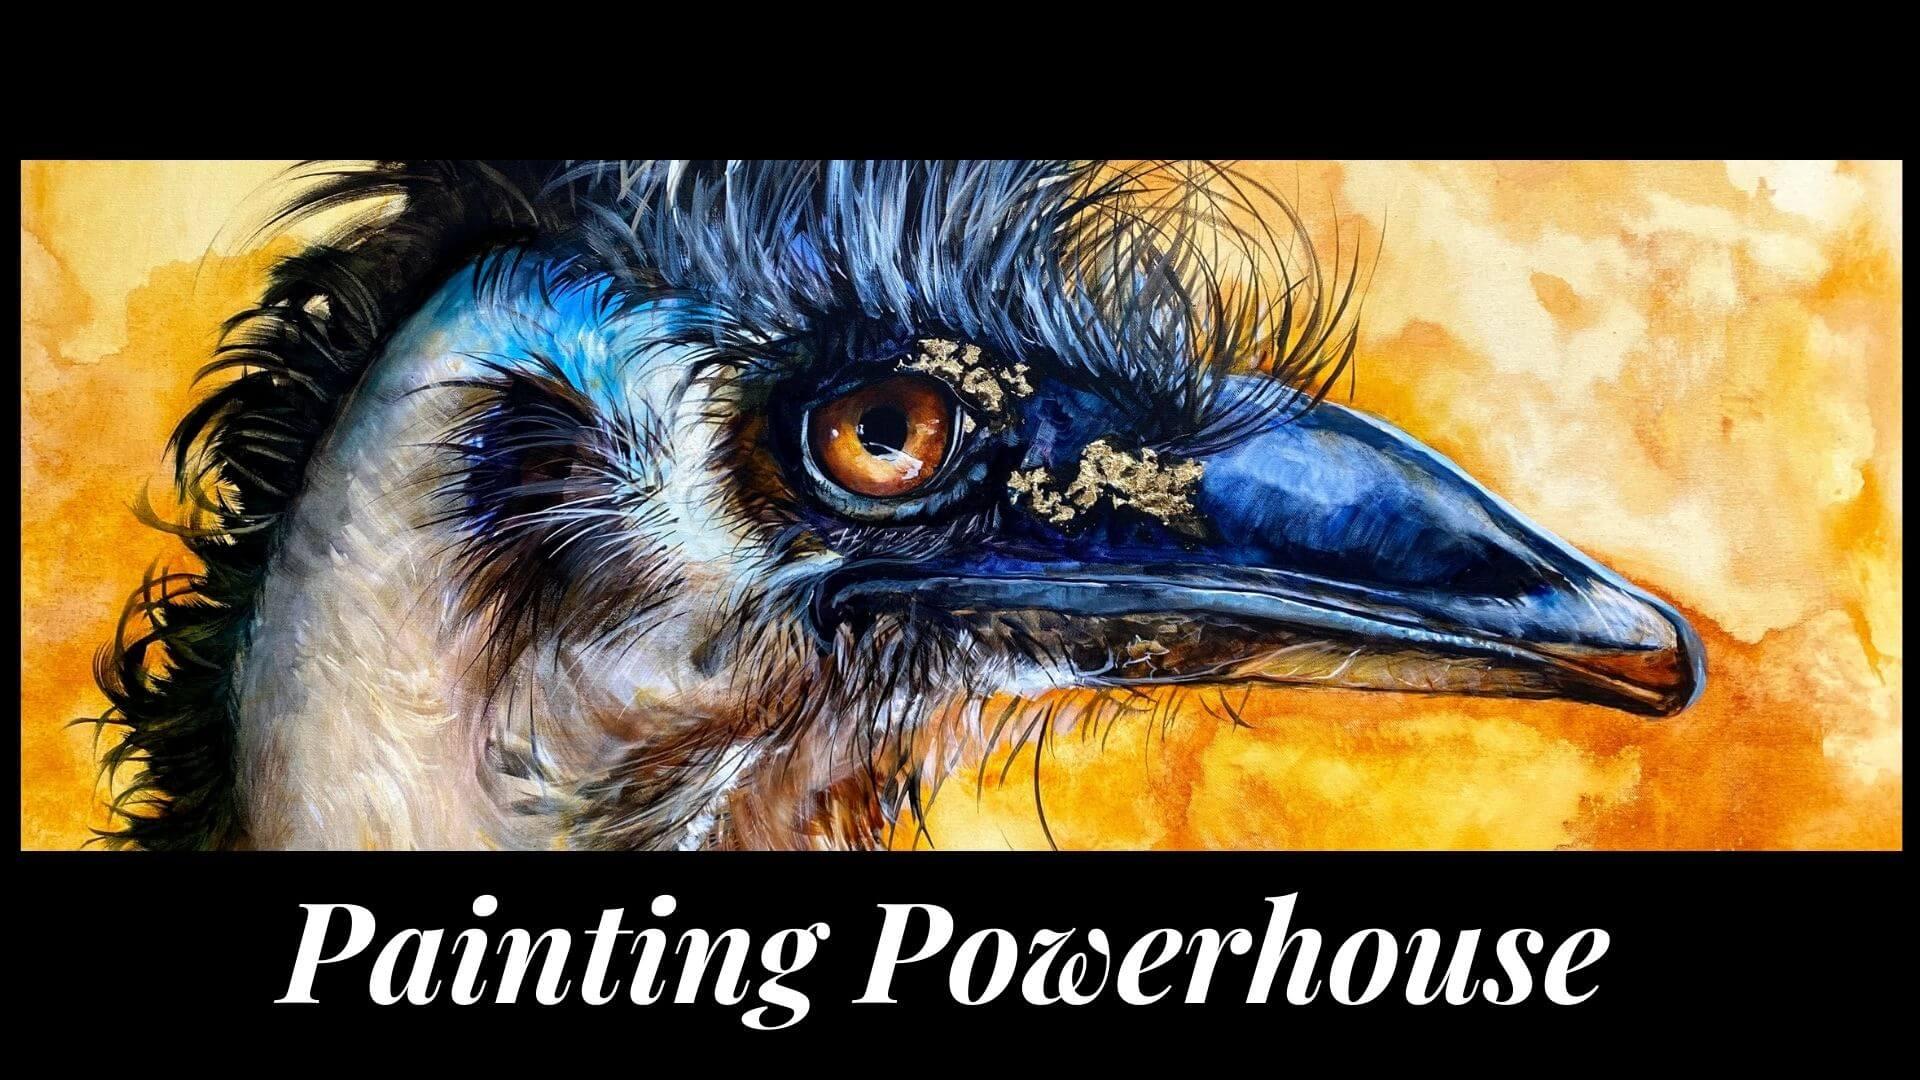 PaintingPowerhouseBanner